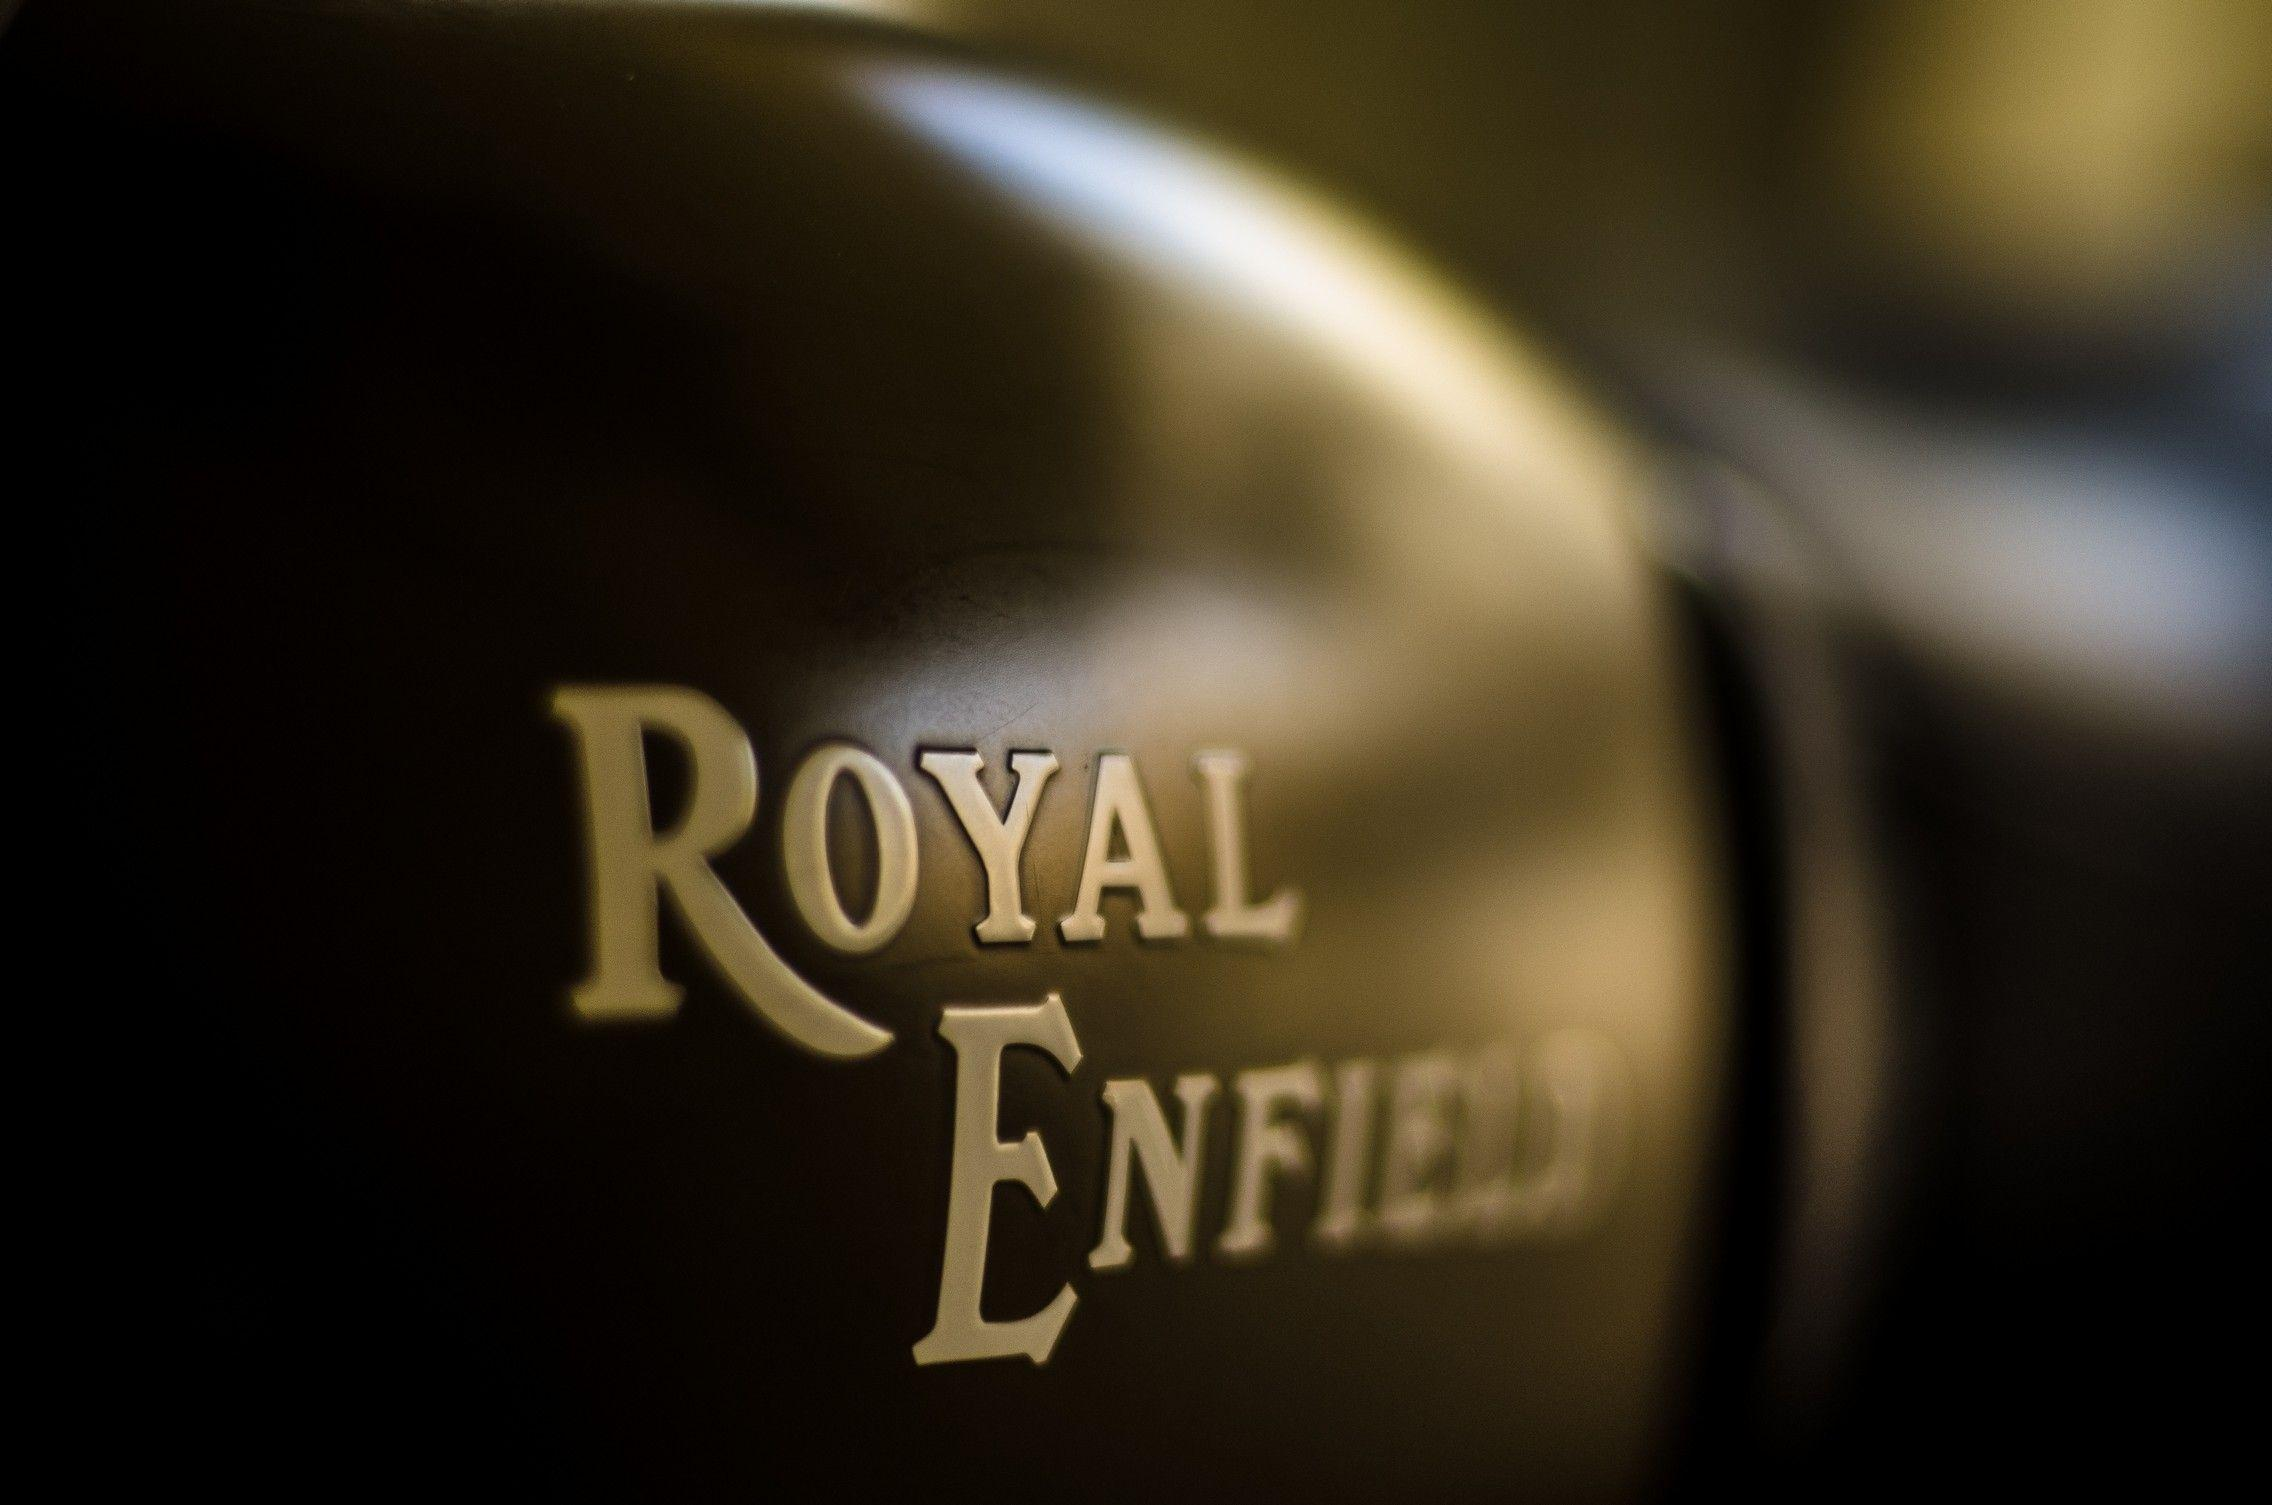 Royal Enfield Logo Wallpapers Wallpaper Cave